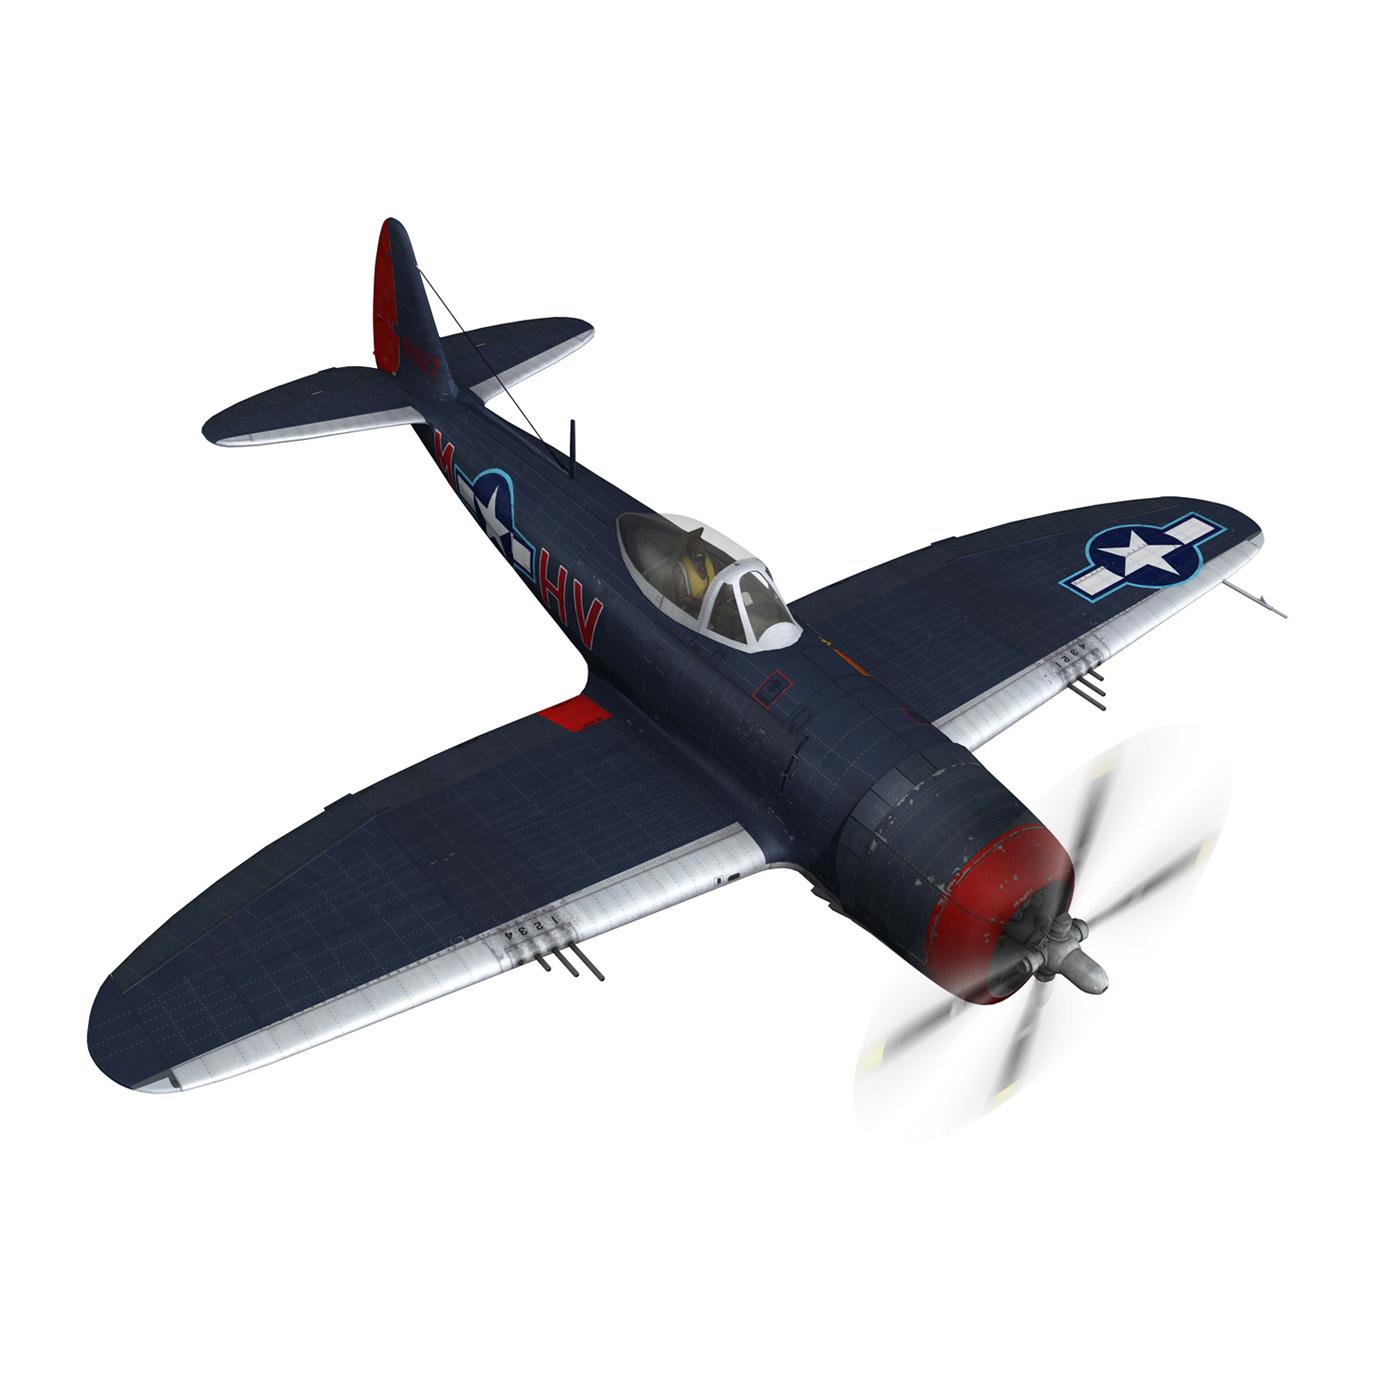 republic p-47m thunderbolt – pengie v 3d model 3ds c4d fbx lwo lw lws obj 279723